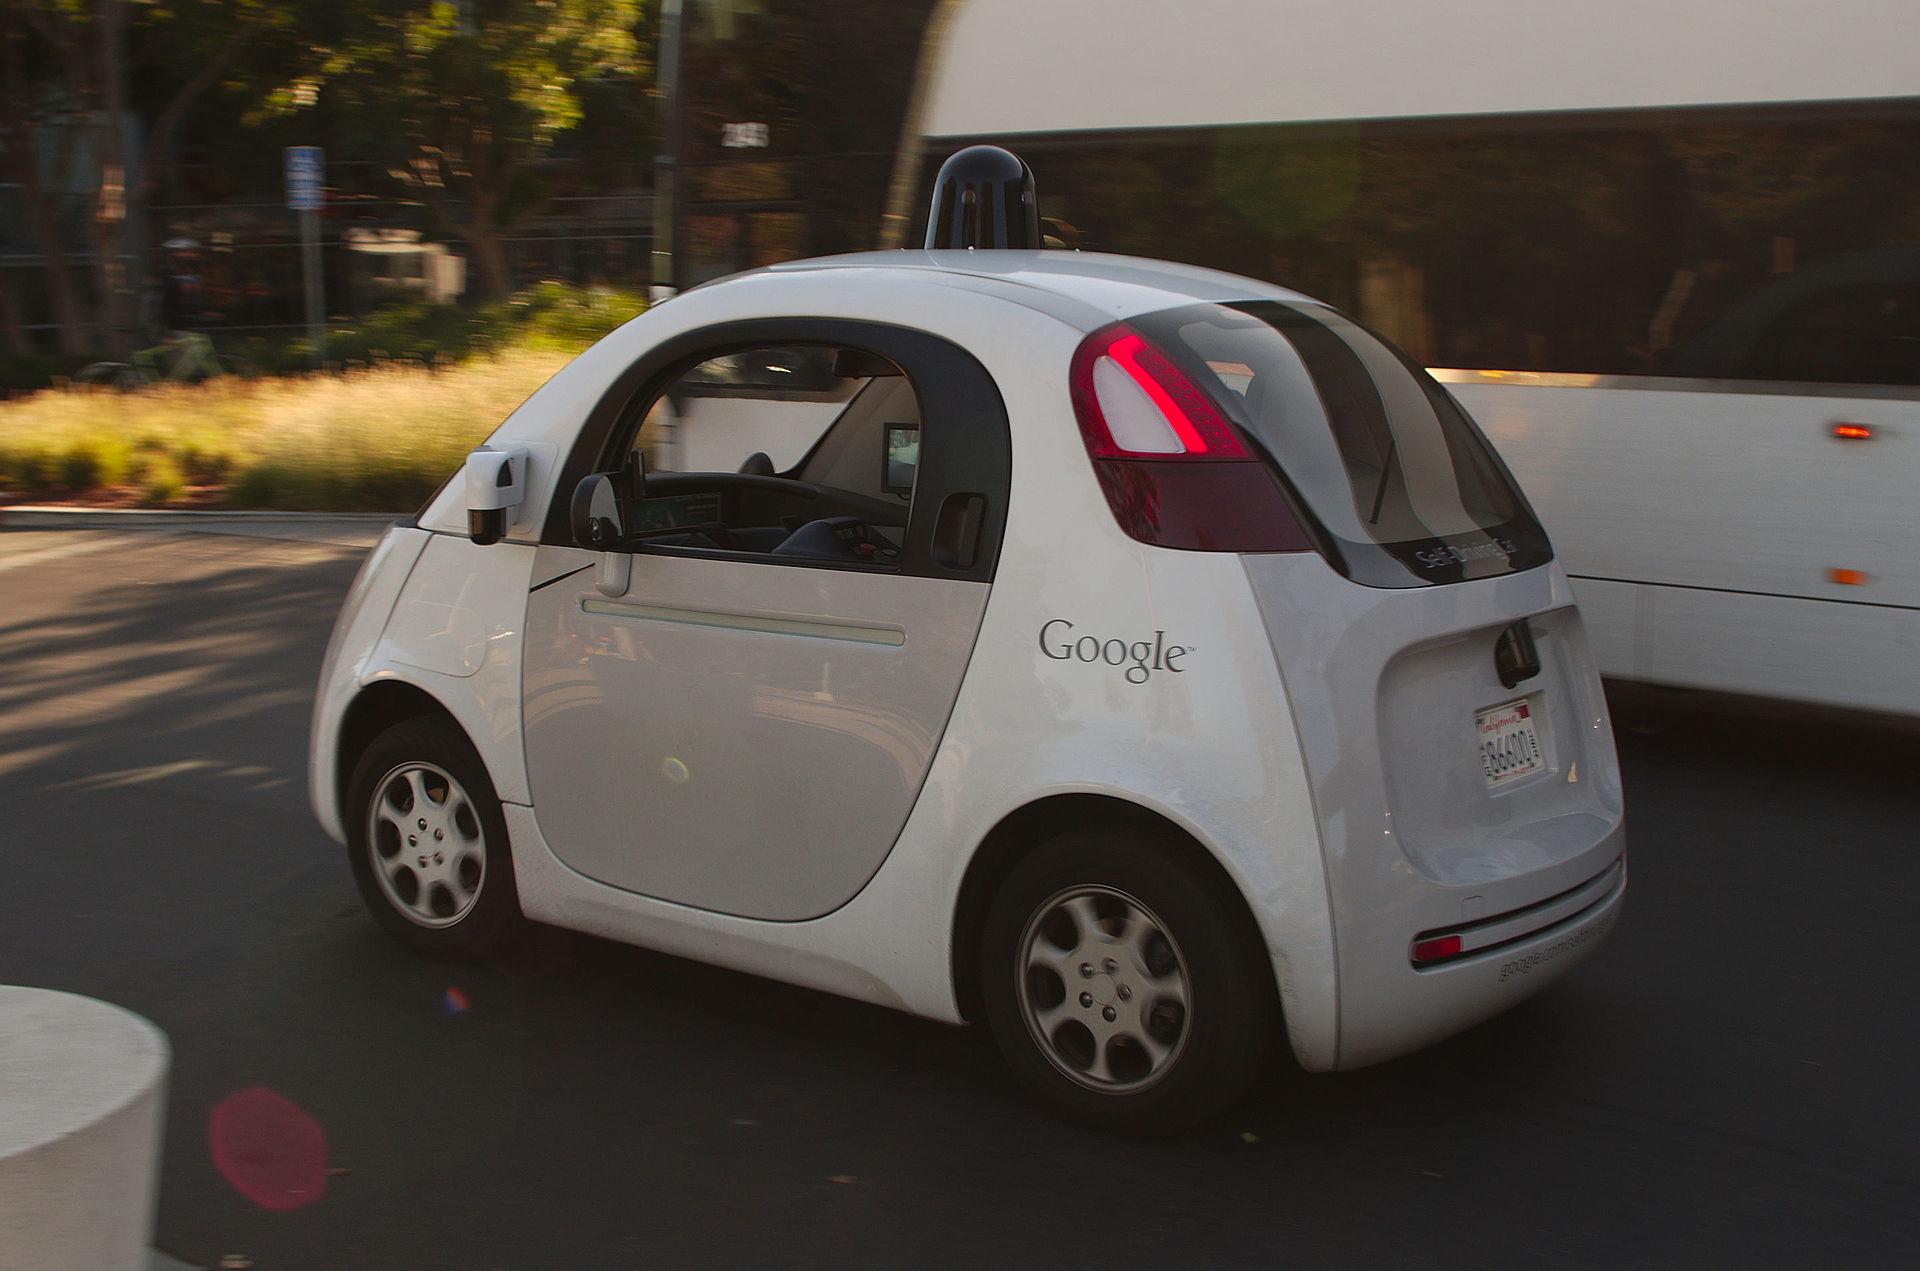 Google_self_driving_car_at_the_Googleplex.jpg